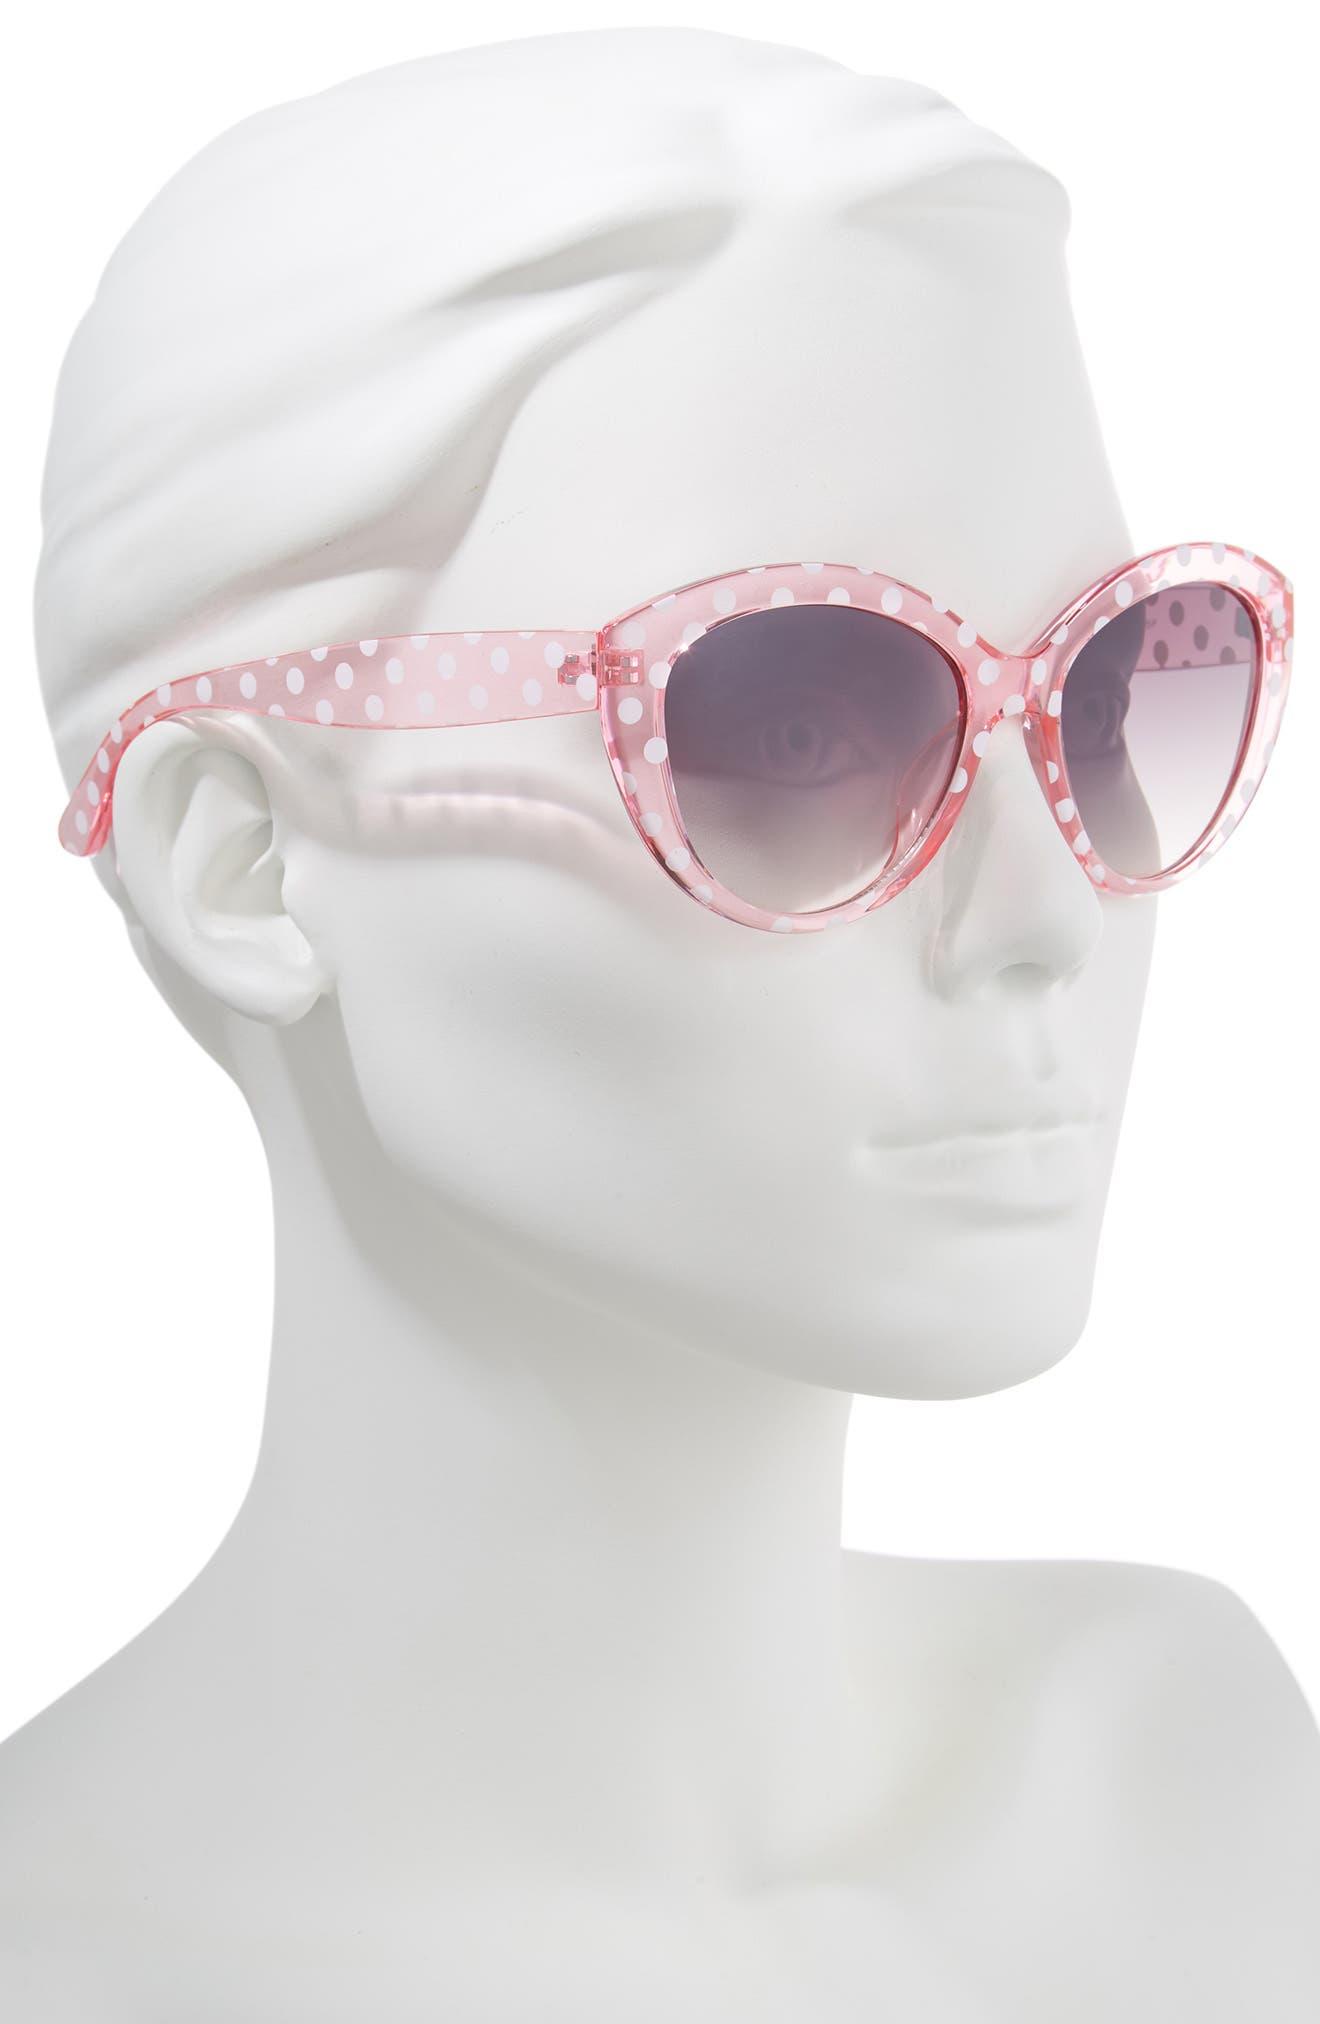 55mm Translucent Polka Dot Cat Eye Sunglasses,                             Alternate thumbnail 2, color,                             PINK/ BLACK